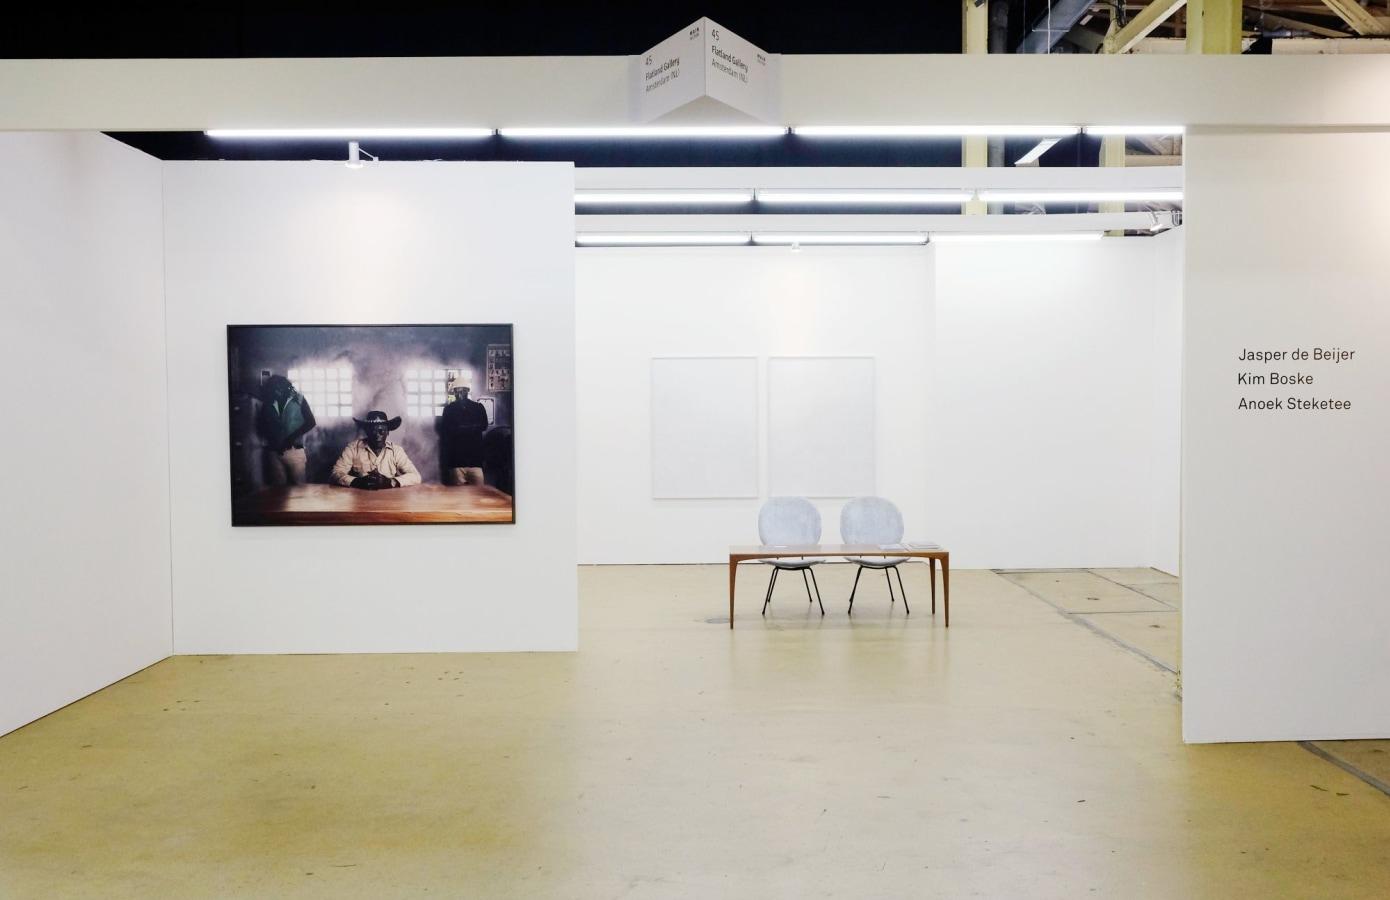 Art Rotterdam 2019, Jasper de Beijer, Kim Boske, Erwin Olaf, Anoek Steketee,